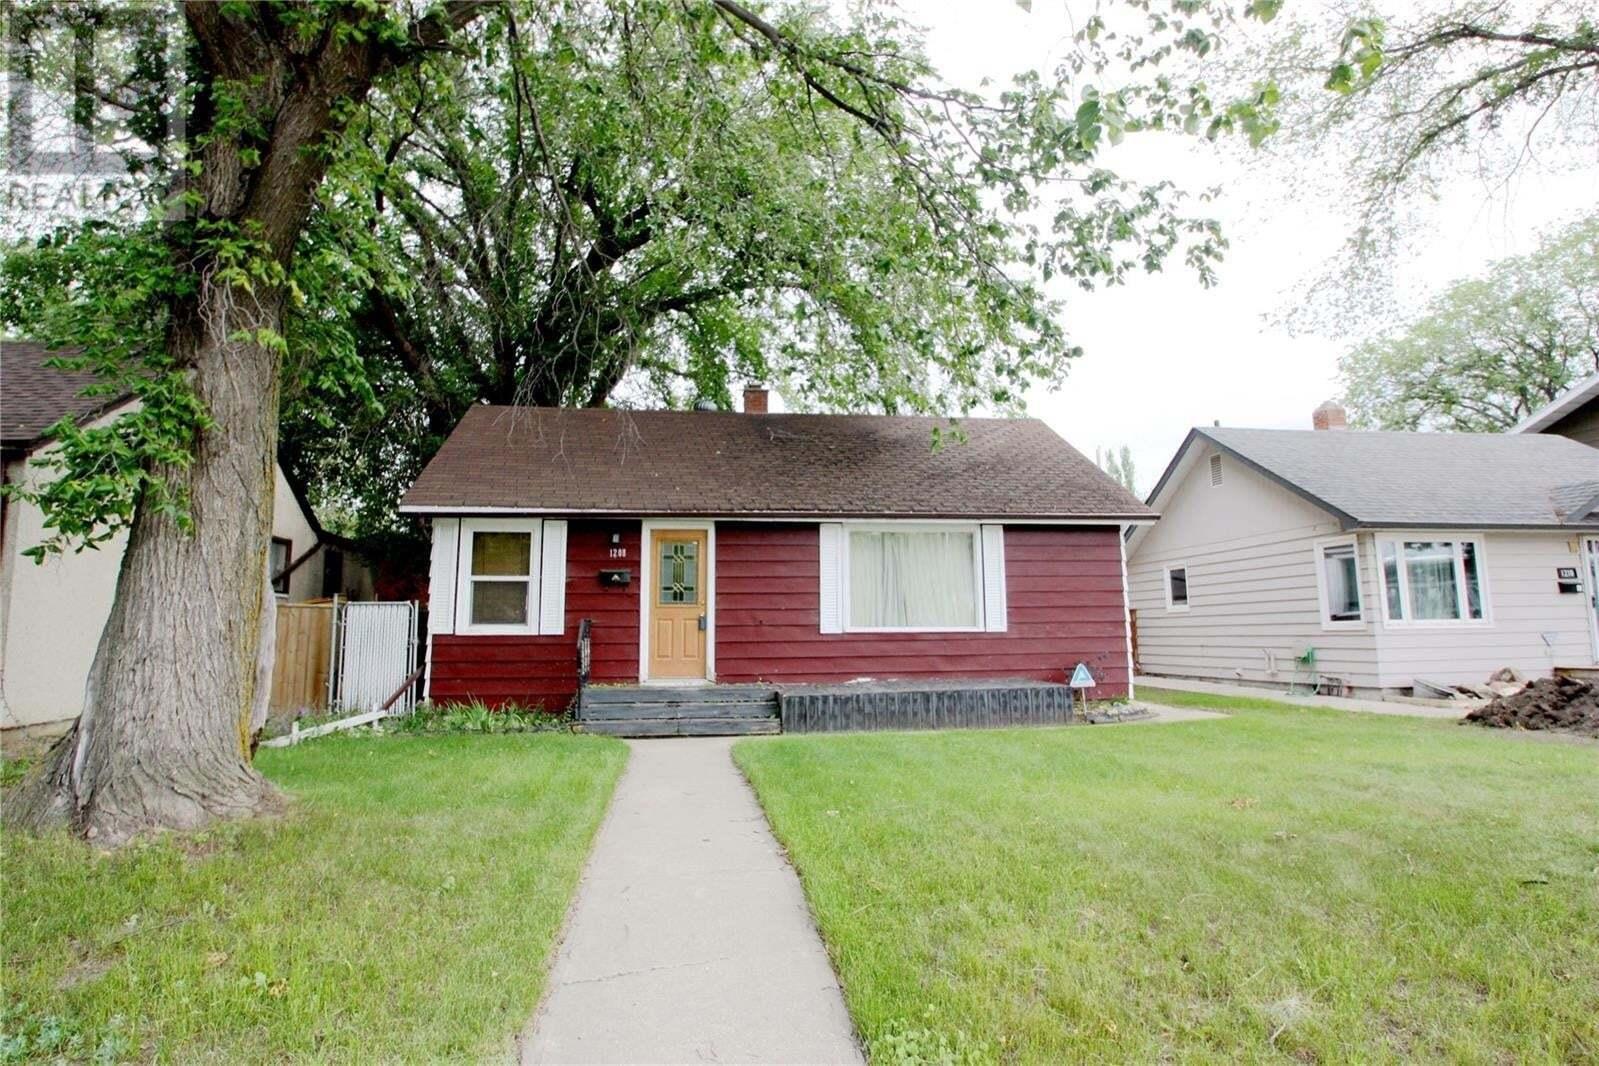 House for sale at 1208 33rd St E Saskatoon Saskatchewan - MLS: SK823866